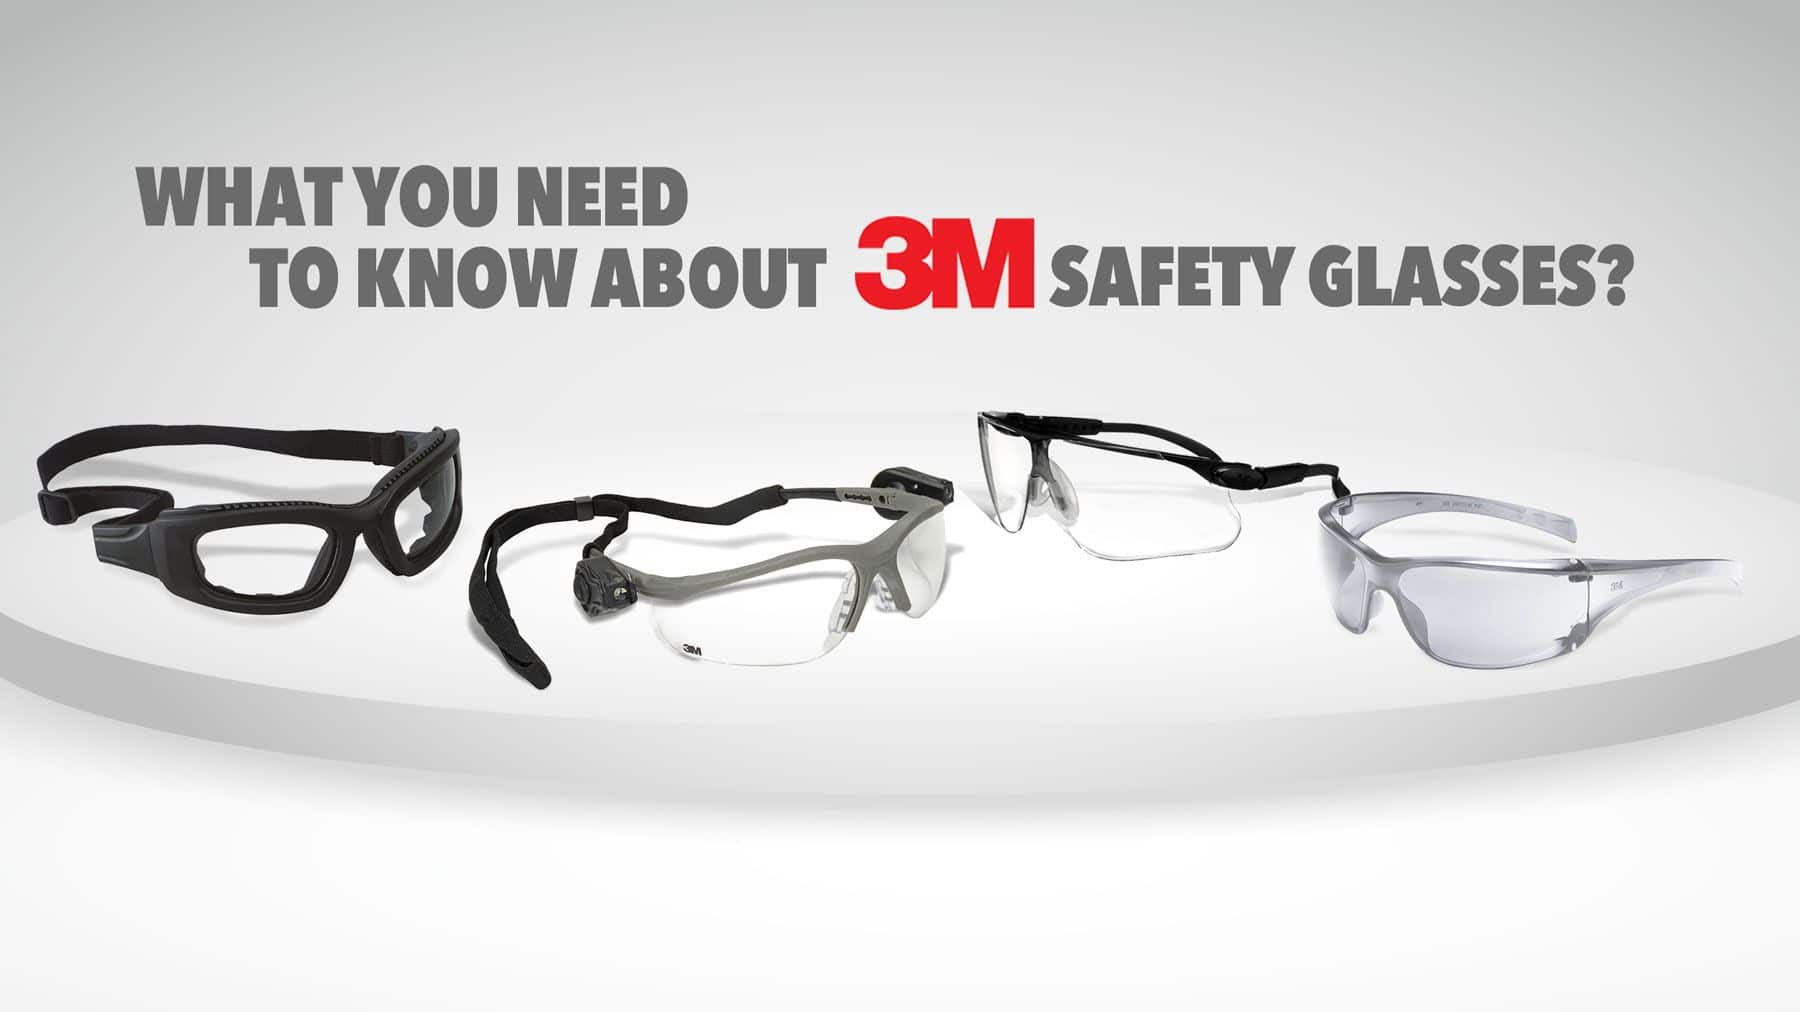 3M SAFETY GLASSES HEADER